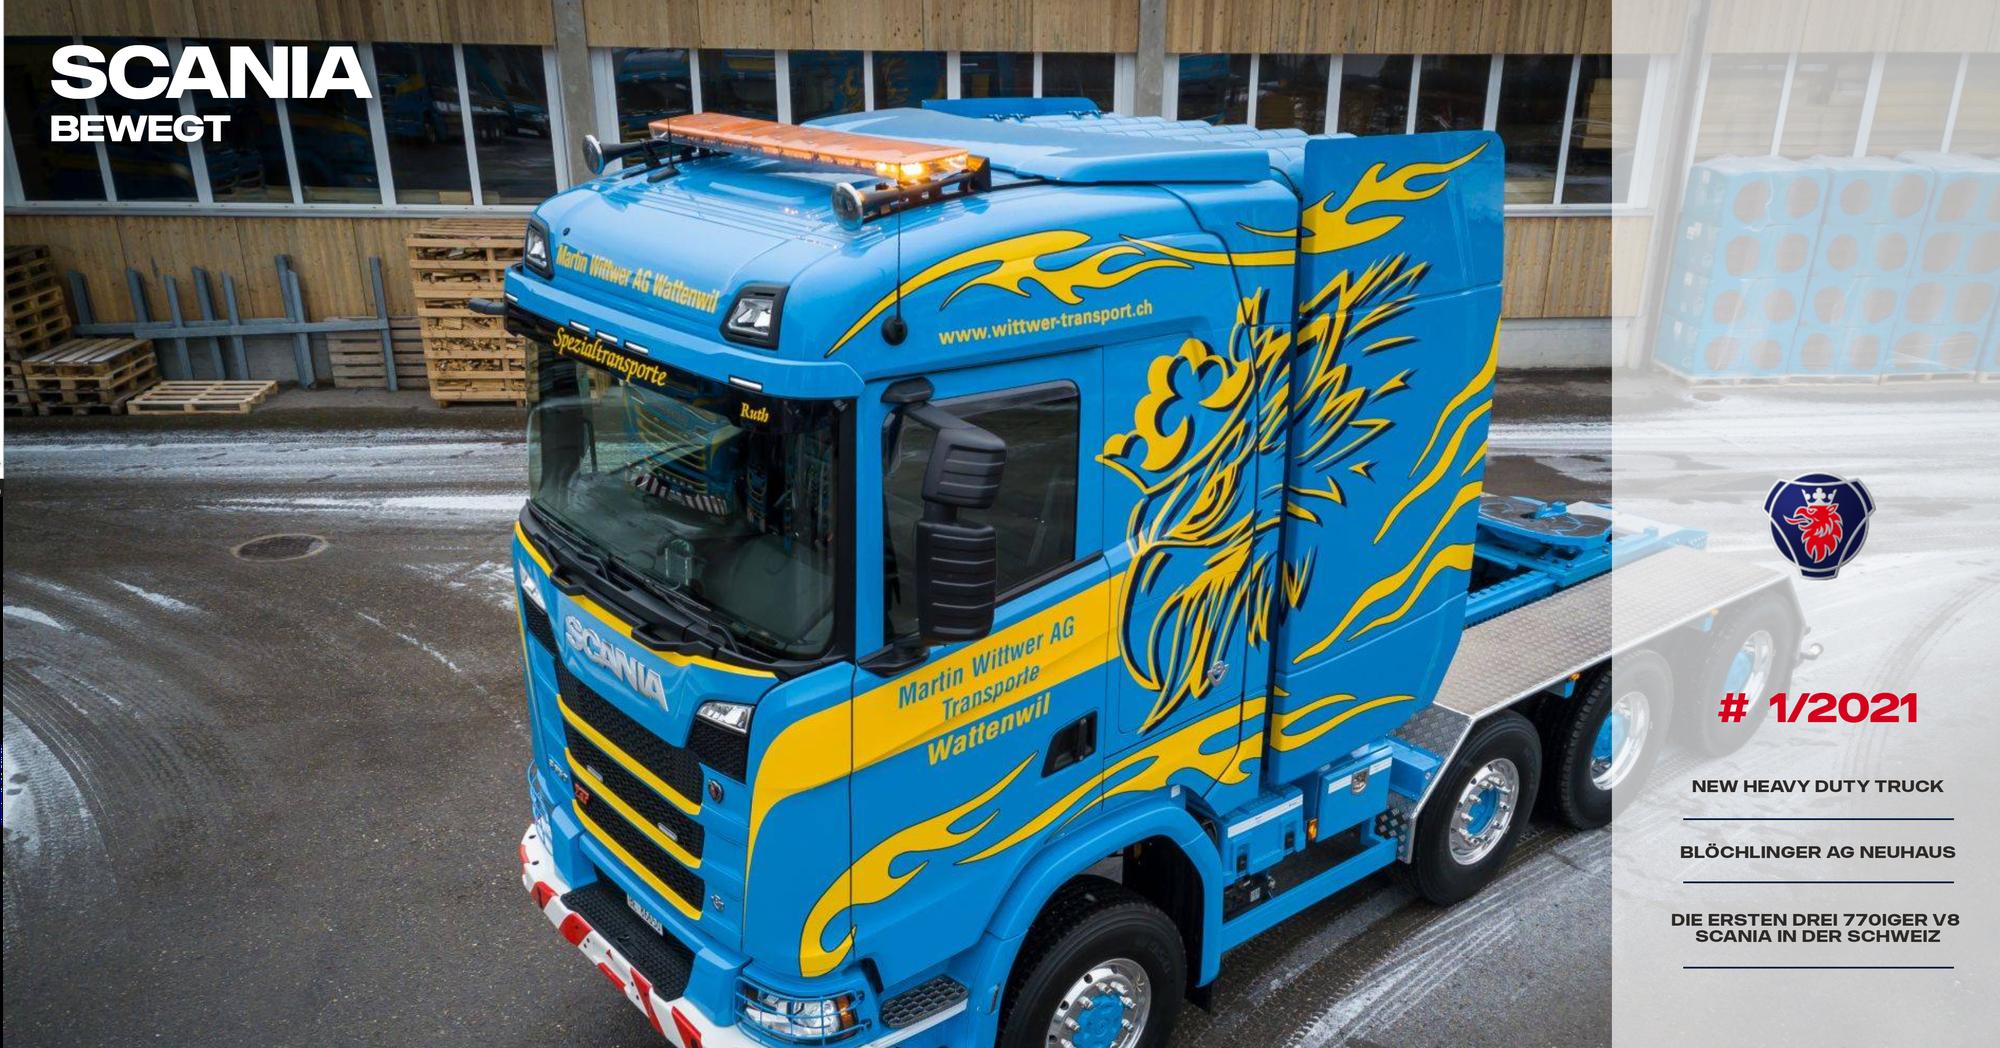 Scania Bewegt #1/2021